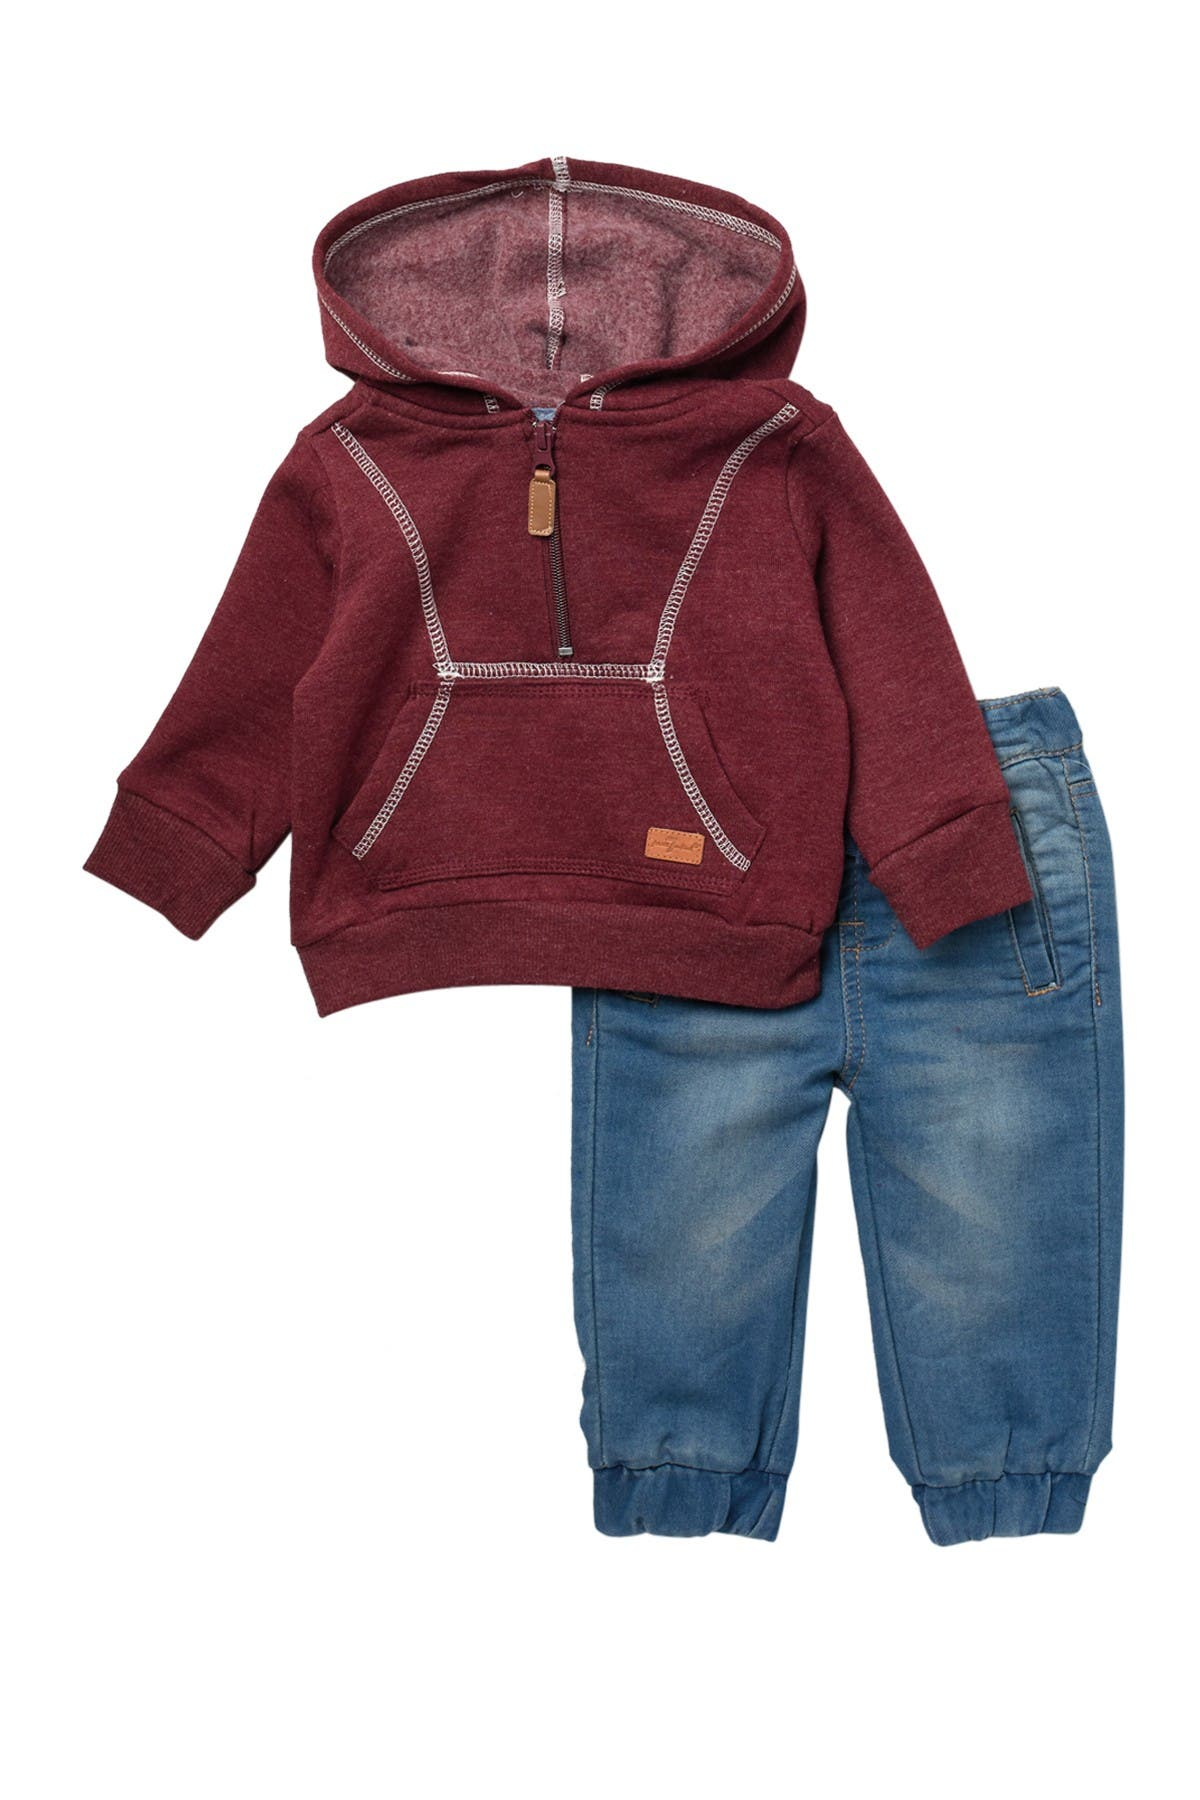 Image of 7 For All Mankind Hooded Sweatshirt & Denim Joggers Set